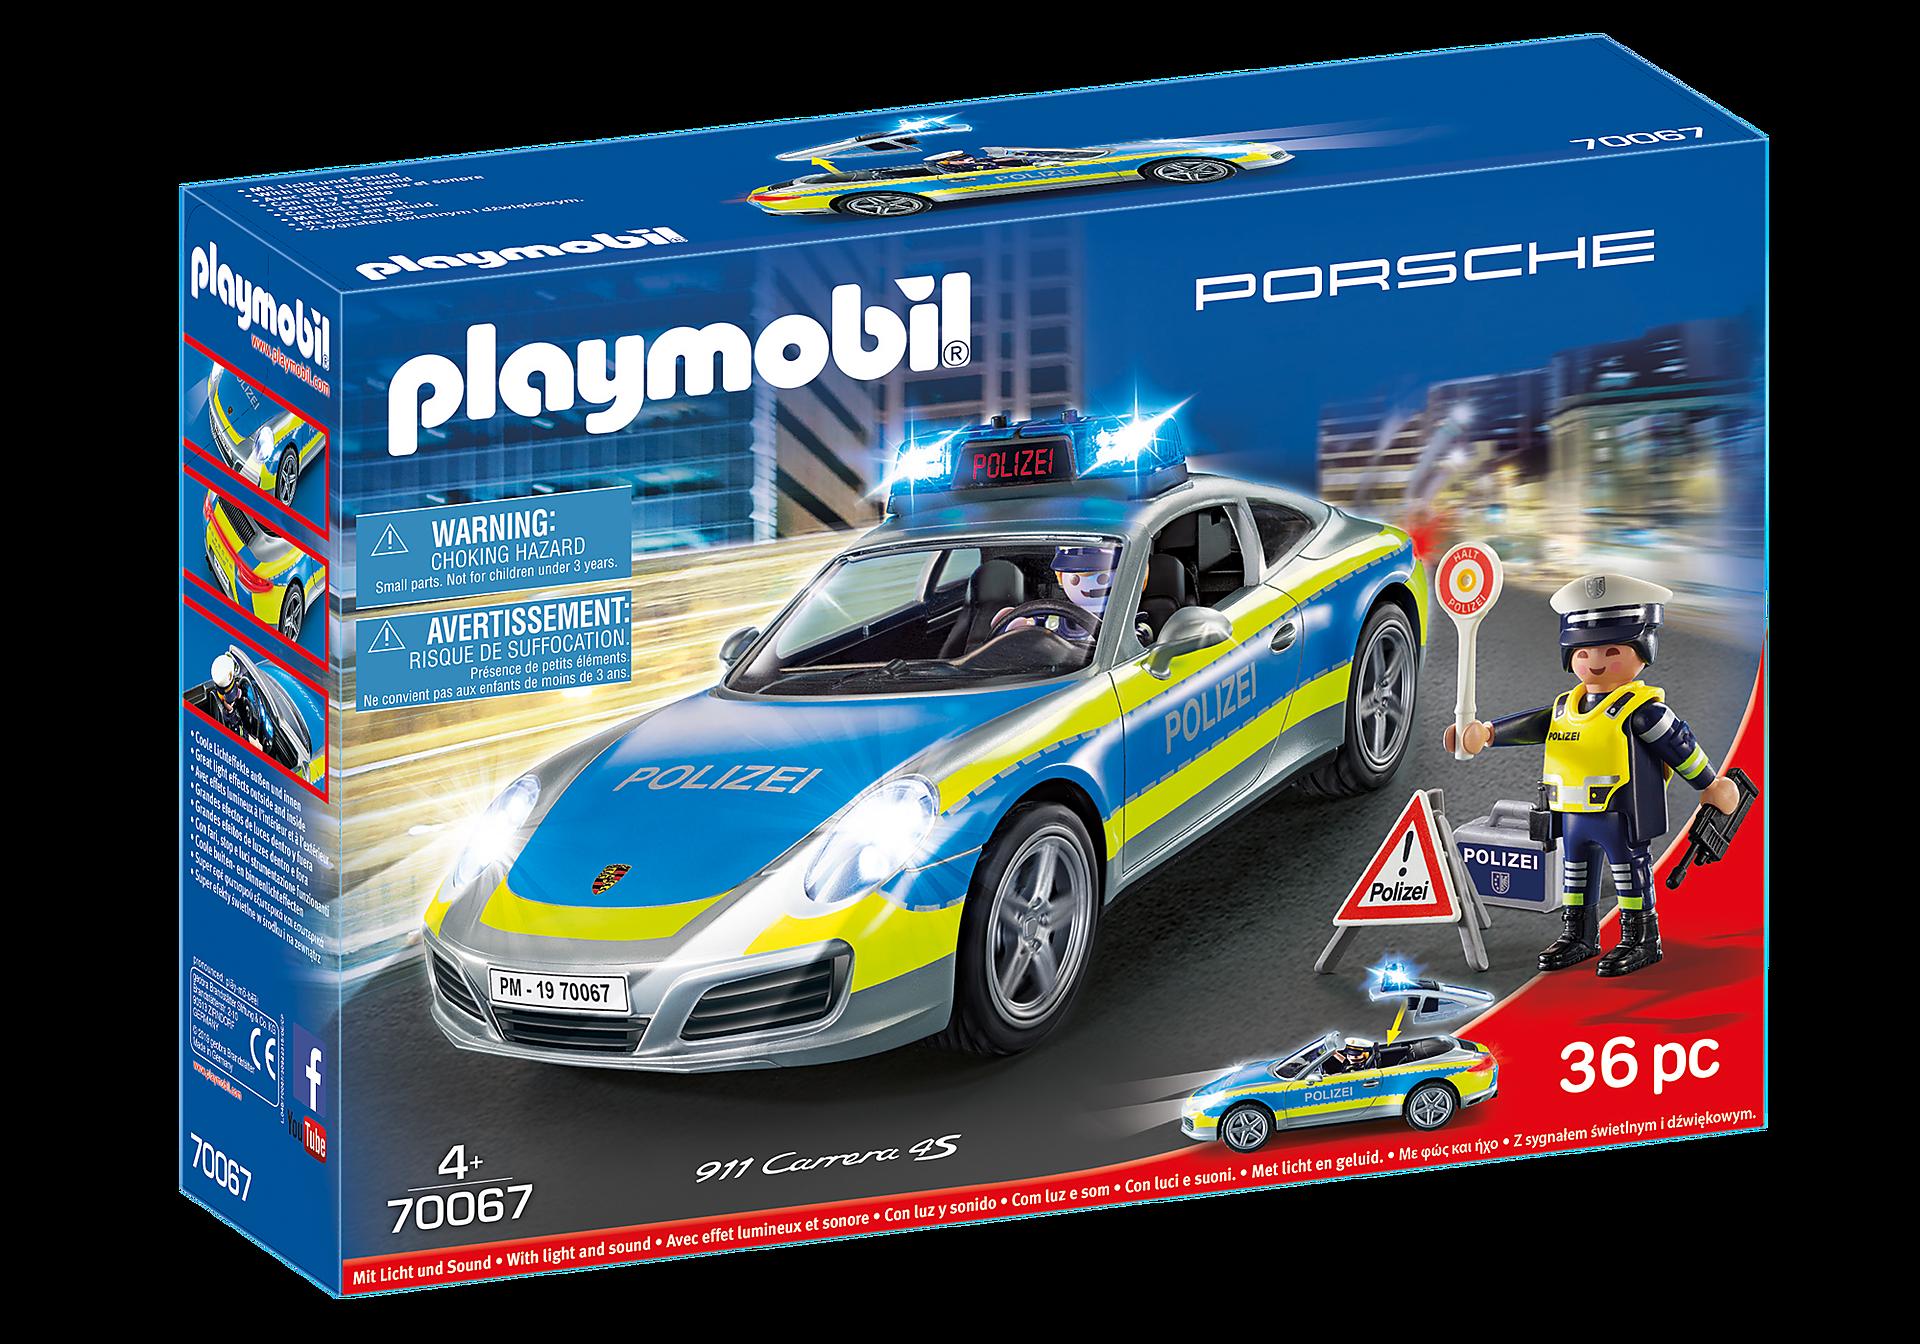 70067 Porsche 911 Carrera 4S Polizei zoom image2